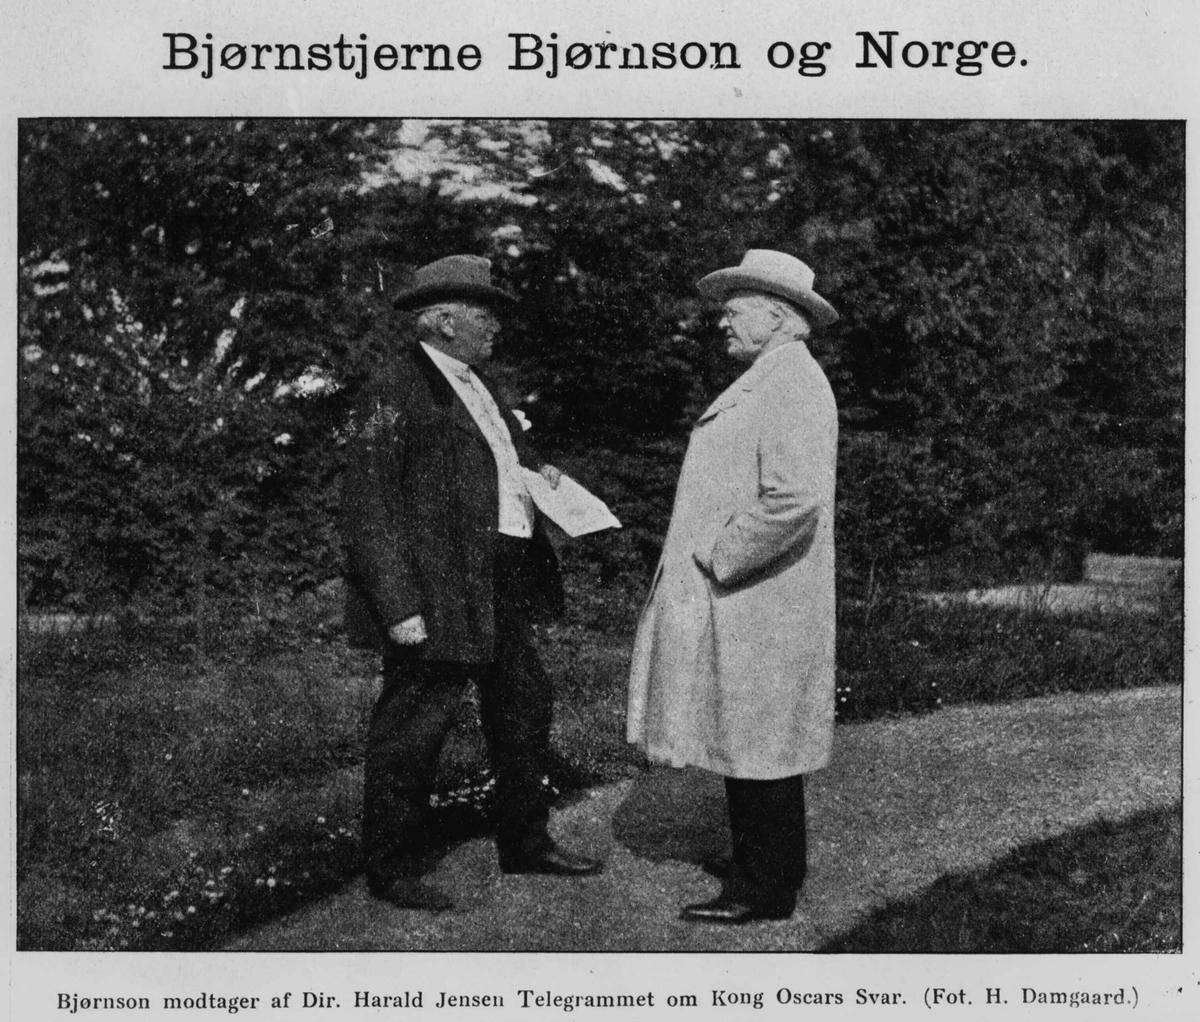 Bjørnson, Jensen, telegram, Kong Oscar,